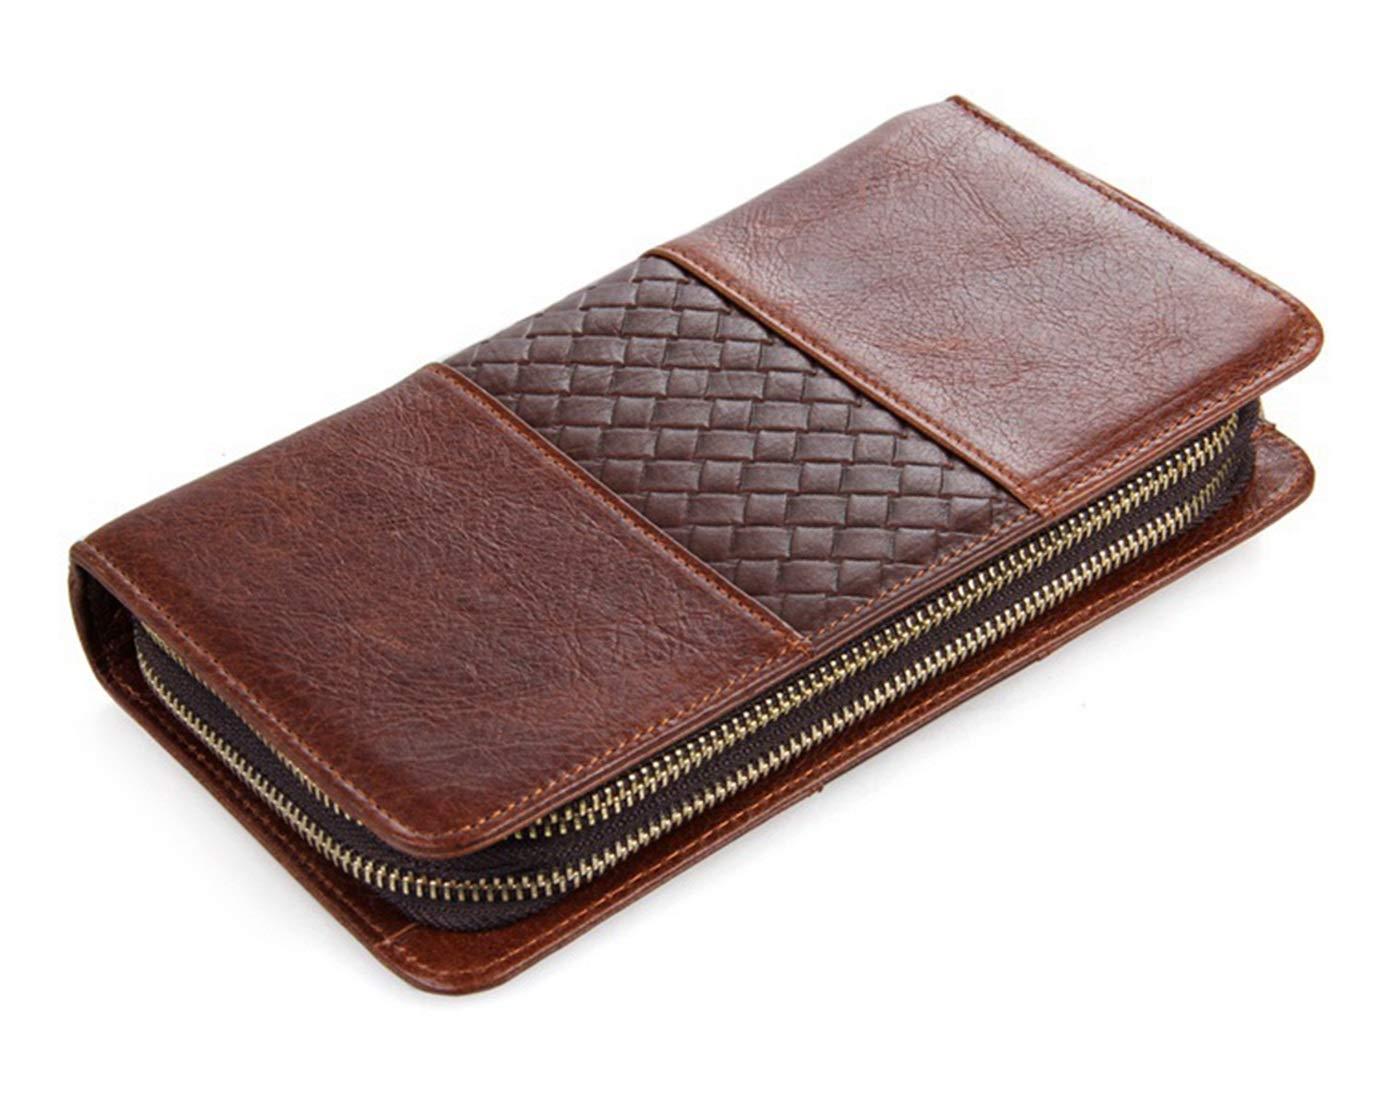 LINDANIG Herren Leder Lange Brieftasche Clutch Bag Bag Bag Business Clutch Bag Zipper Bag (Farbe   braun) B07MGGYYRV Clutches 53b7c2